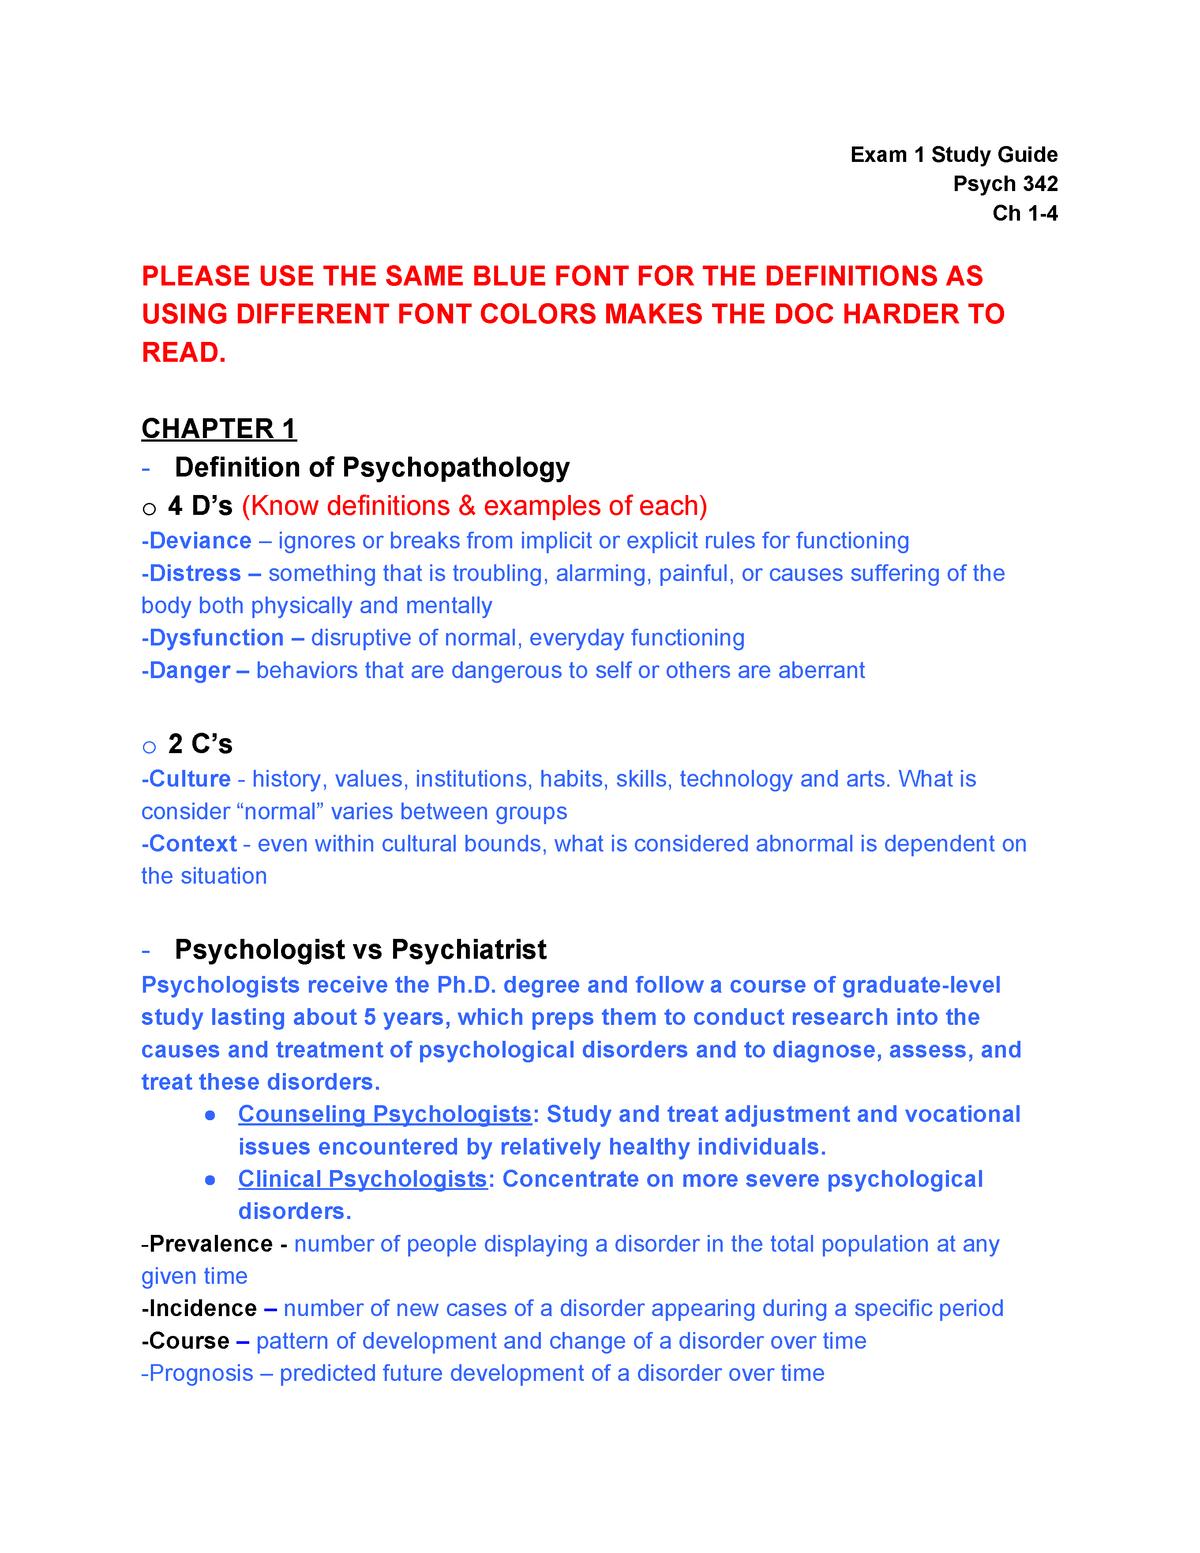 Ab Psych Exam 1 Study Guide Abnormal Psychology Psych 342 Studocu